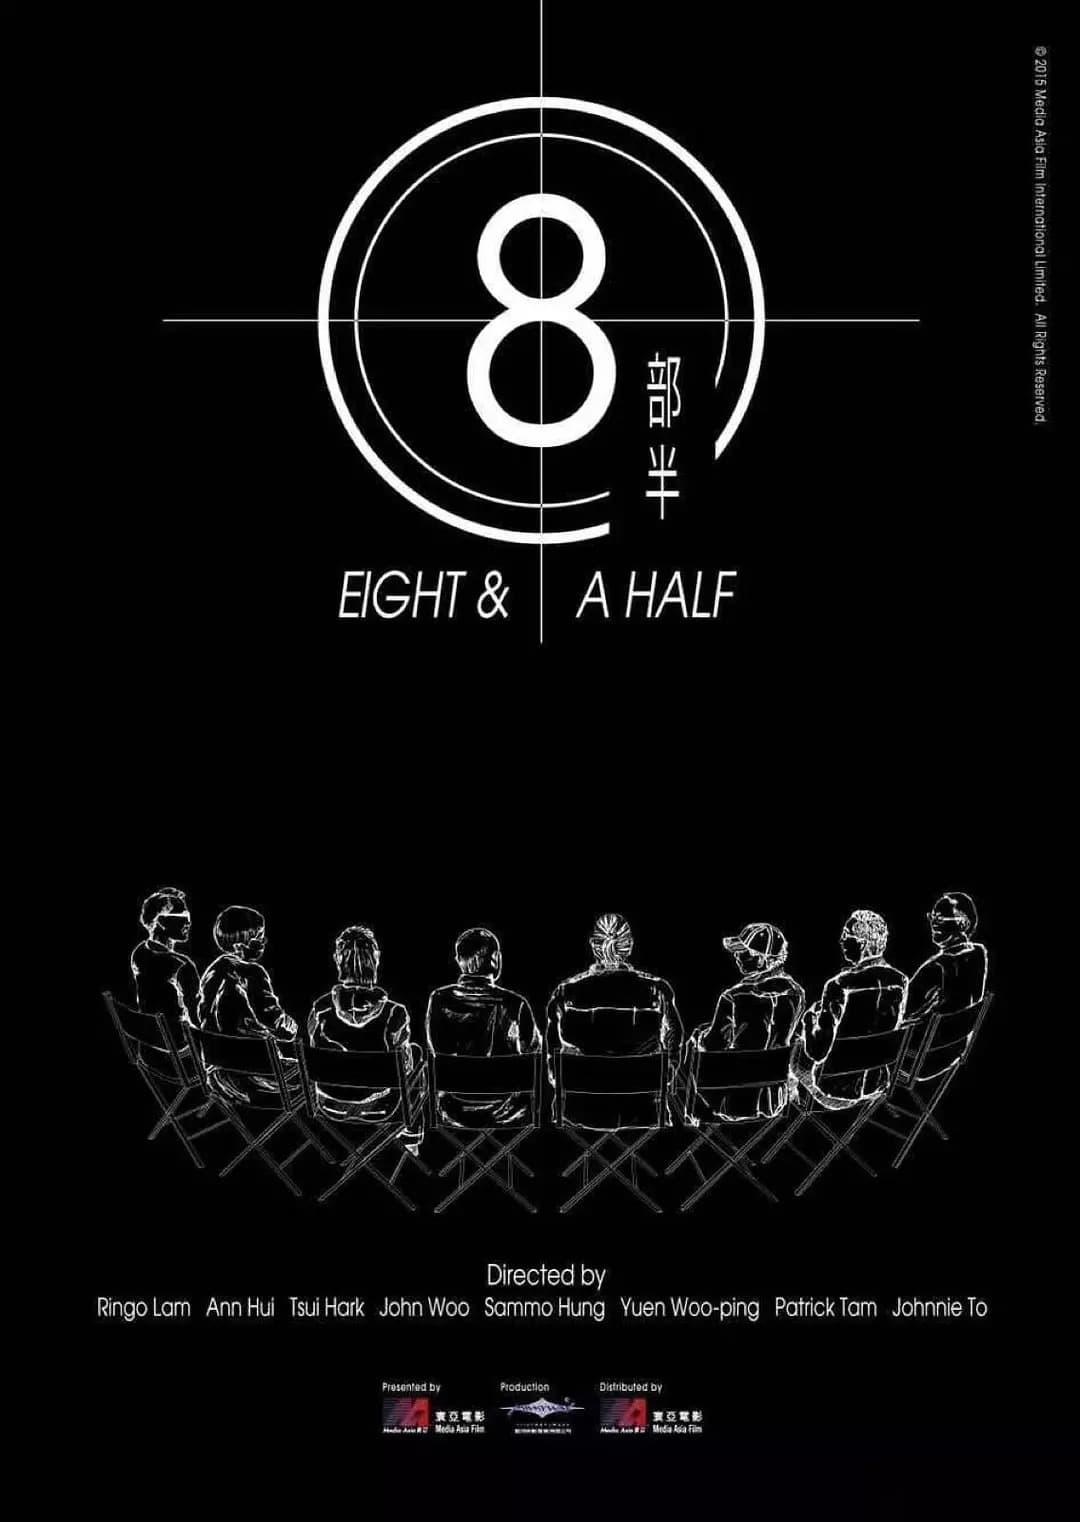 Eight & a Half